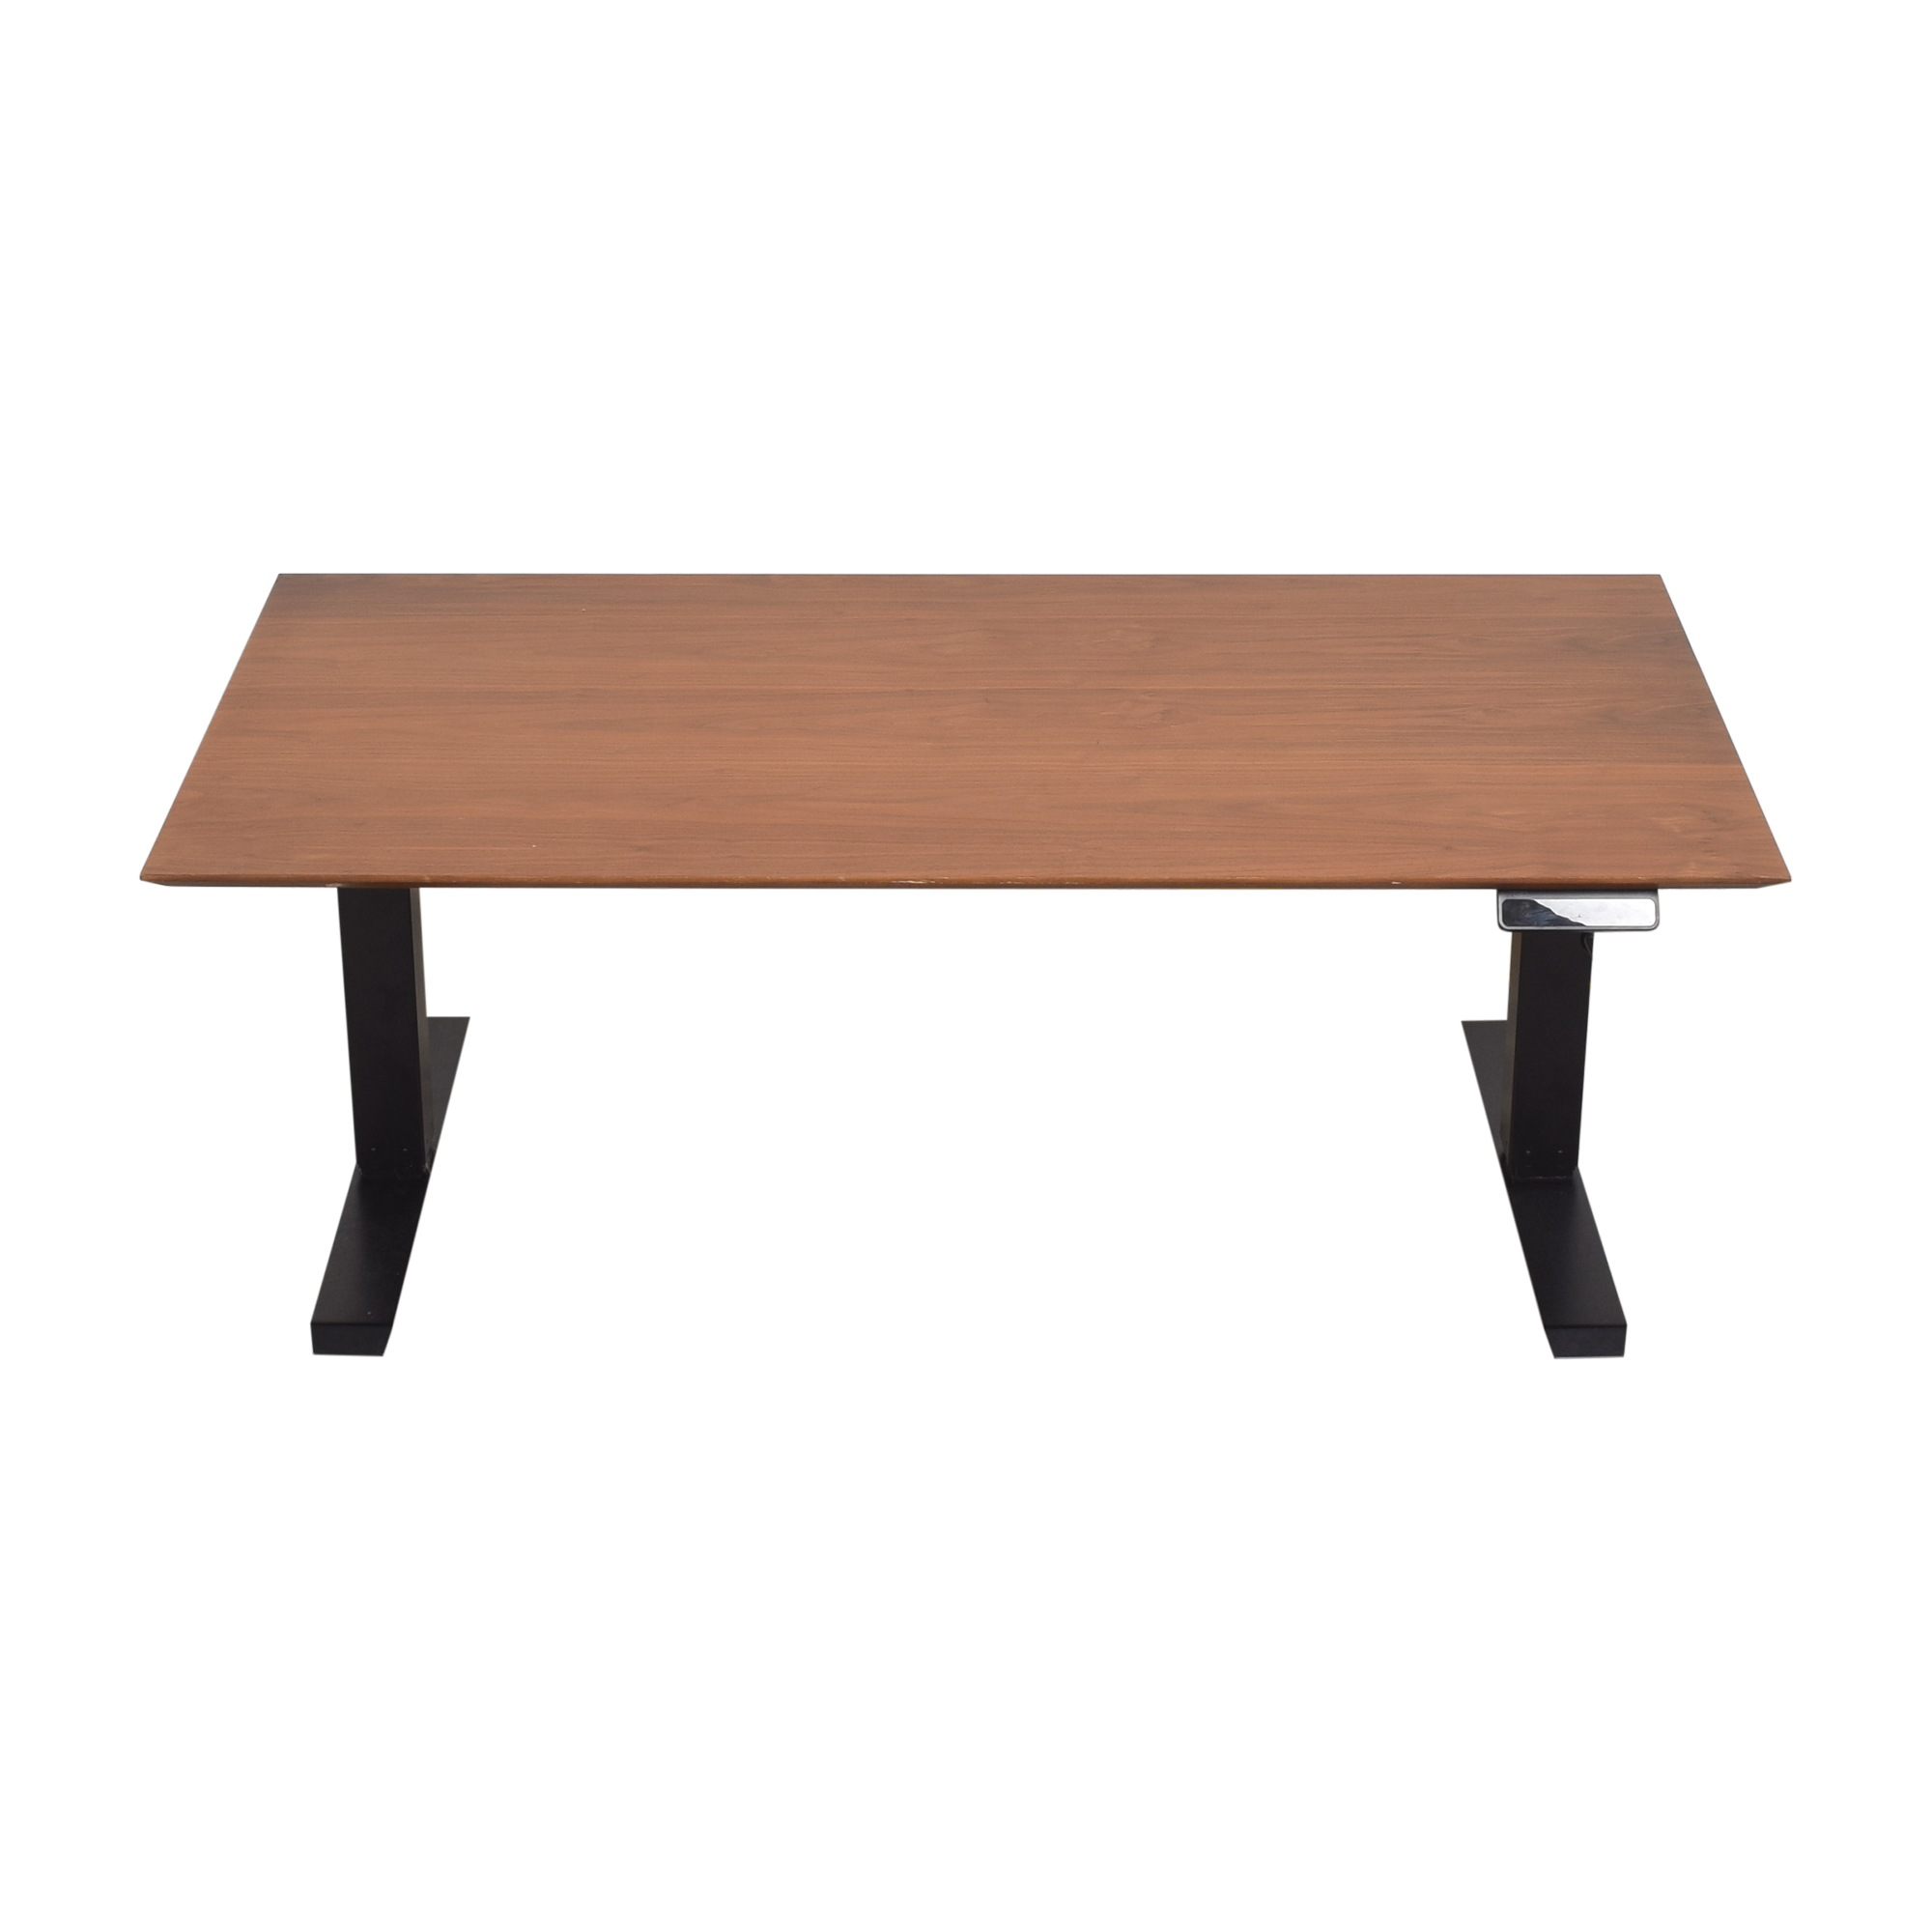 shop West Elm West Elm Mid Century Sit + Stand Adjustable Desk online